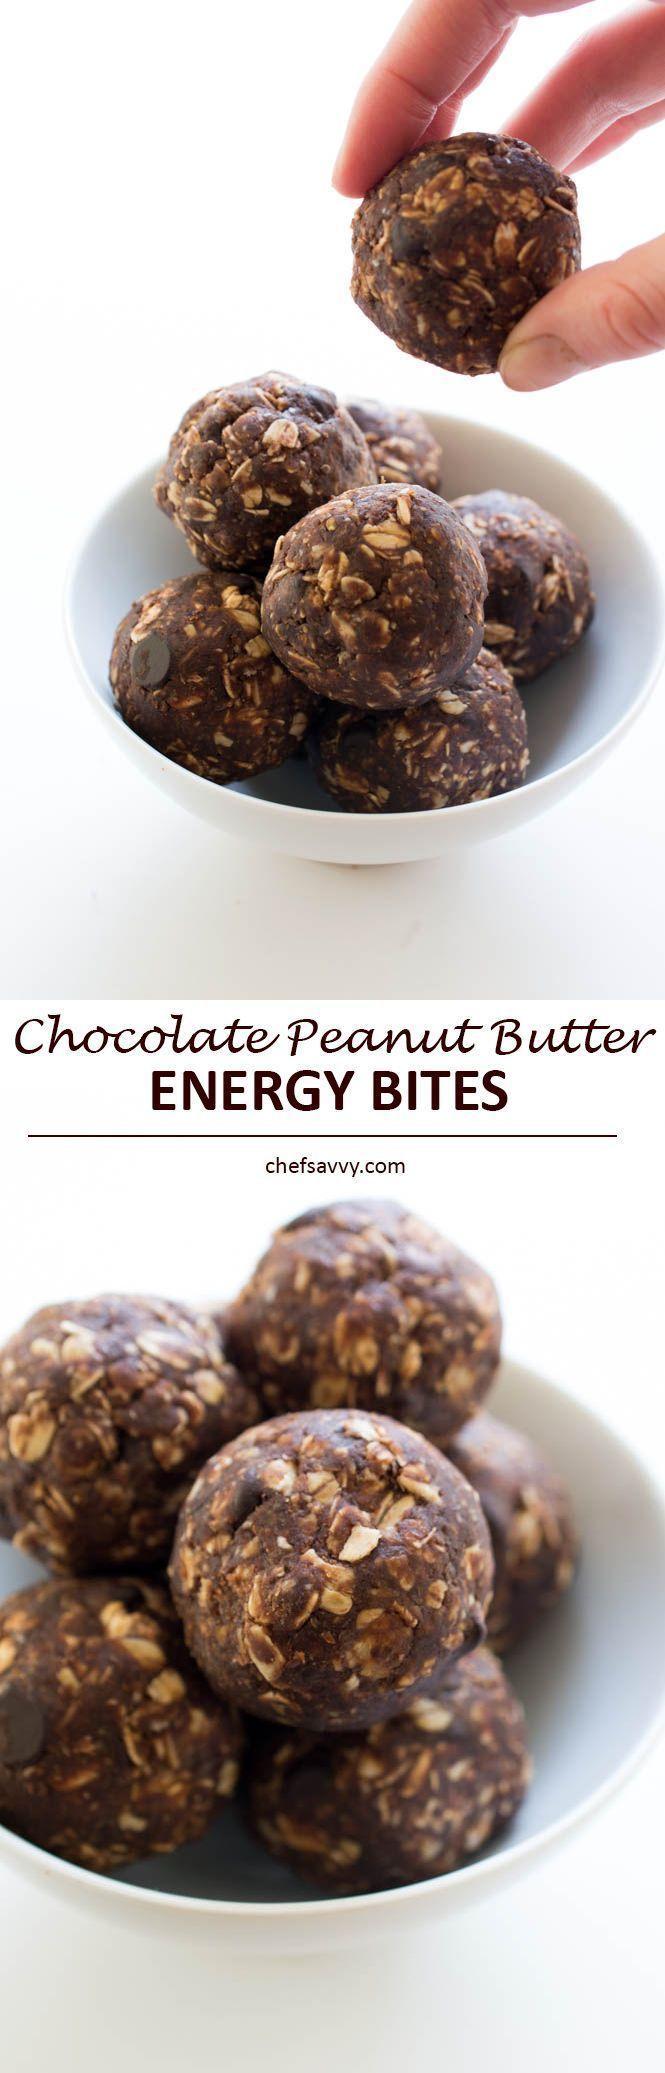 No Bake Chocolate Peanut Butter Energy Bites.